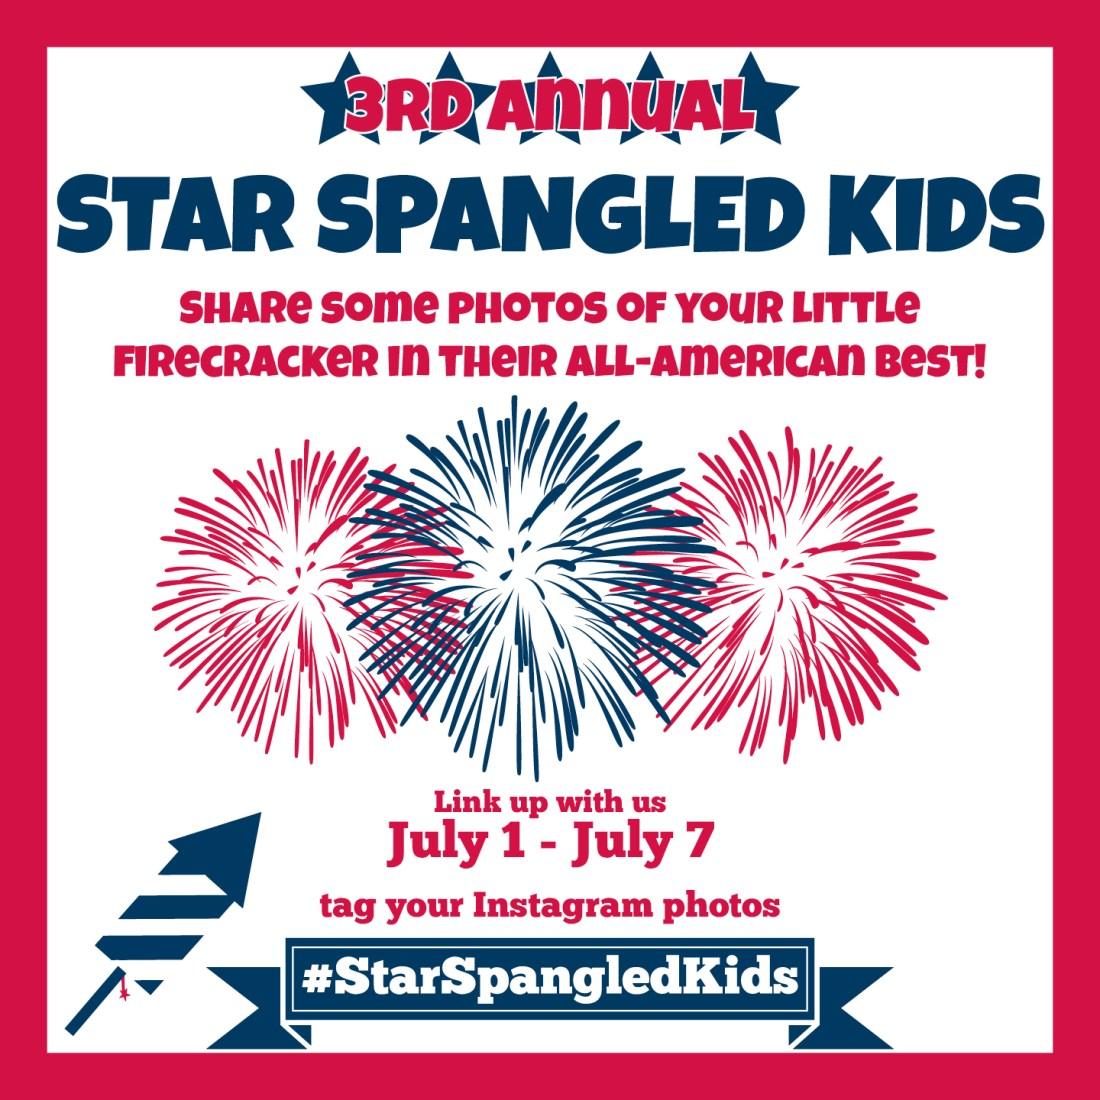 Star Spangled Kids 2017 [#StarSpangledKids] | Ellie And Addie